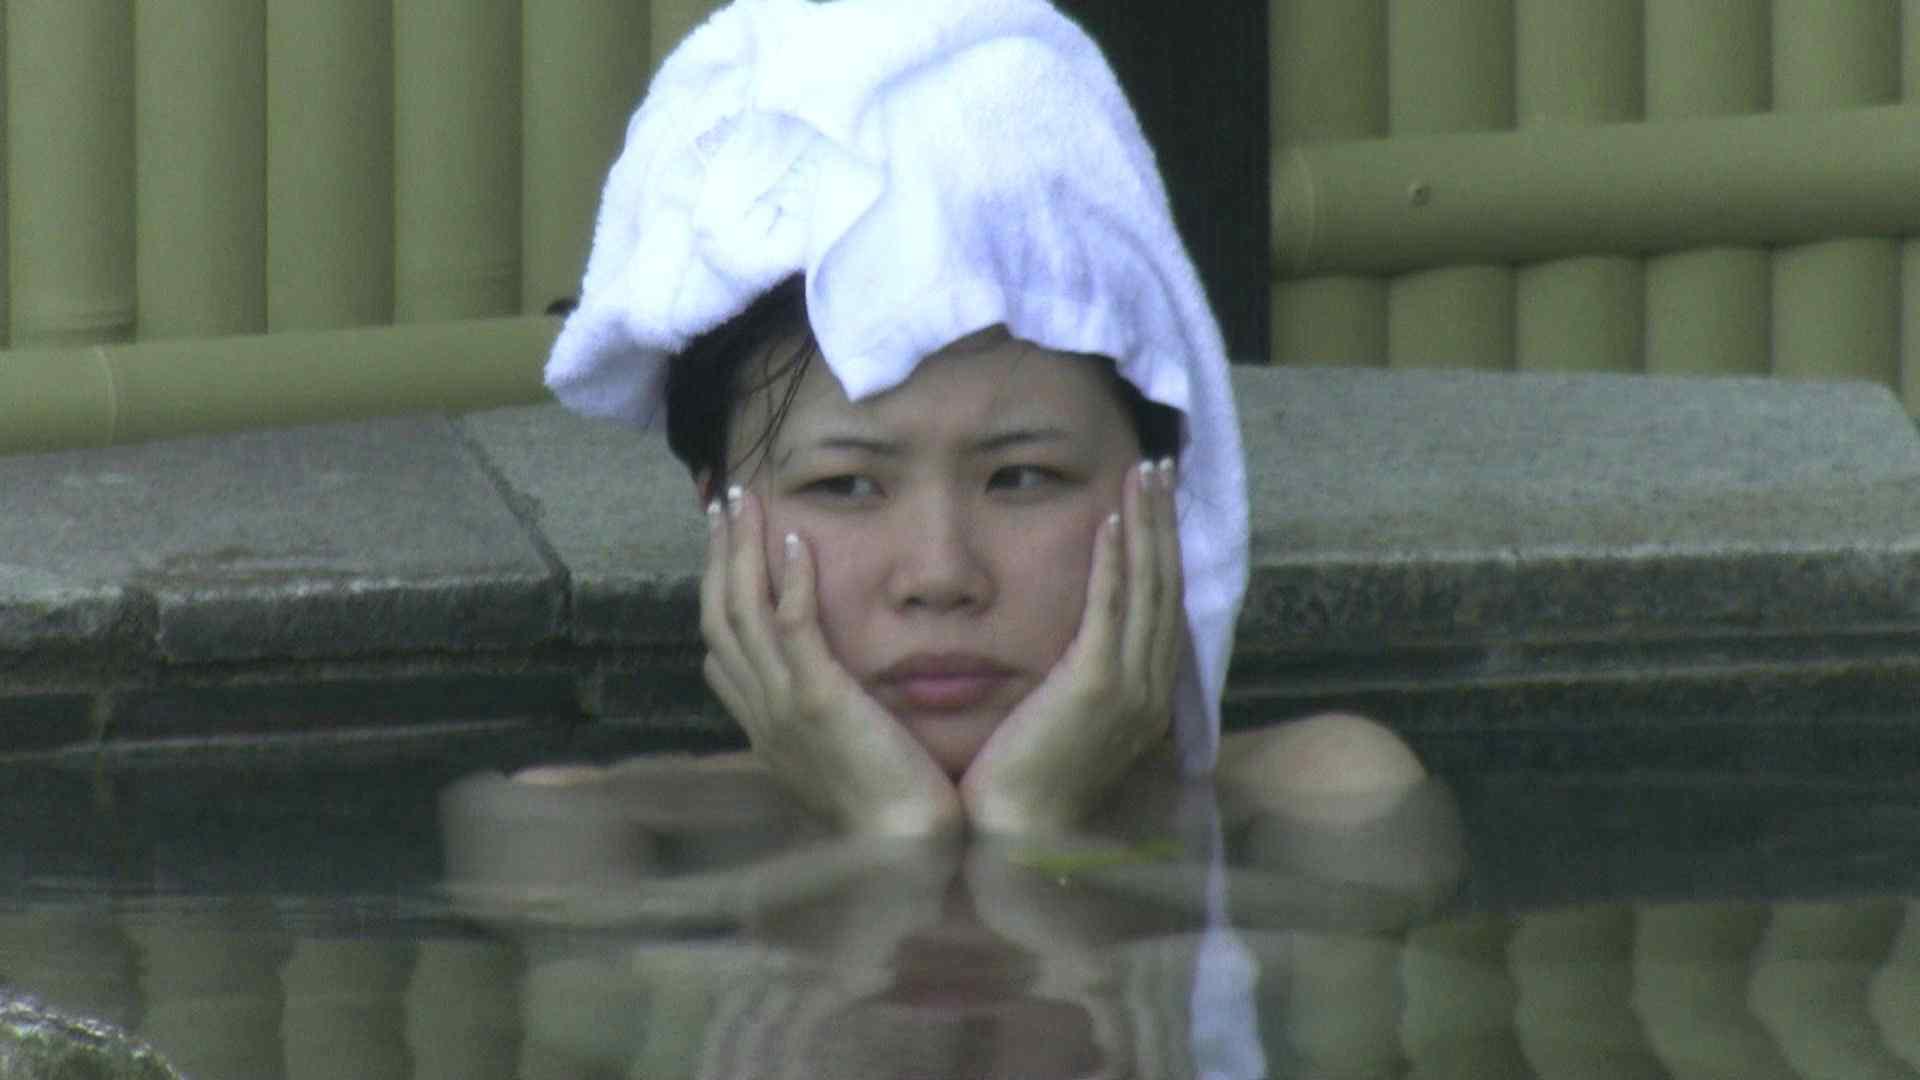 Aquaな露天風呂Vol.183 エッチな盗撮 ワレメ無修正動画無料 106pic 103